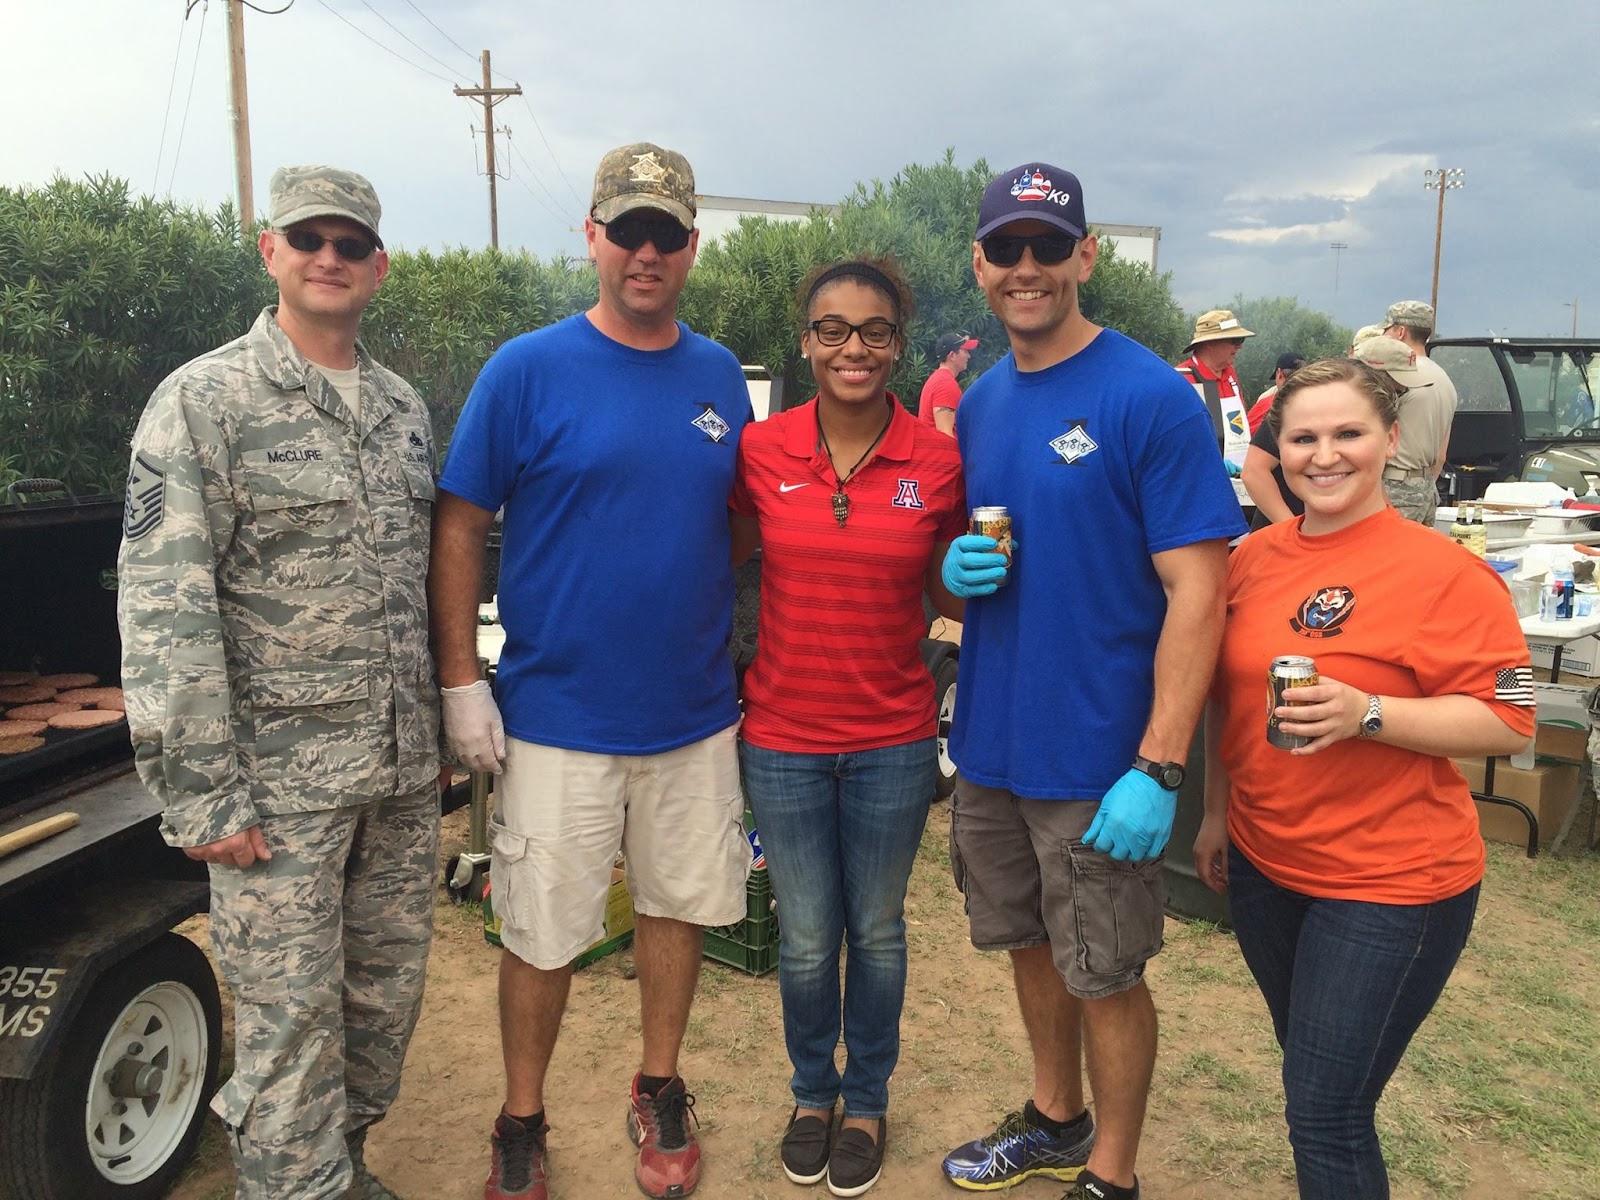 Tucson Thanks our Airmen and Families - 11907209_890713627669418_1299174011240358683_o.jpg